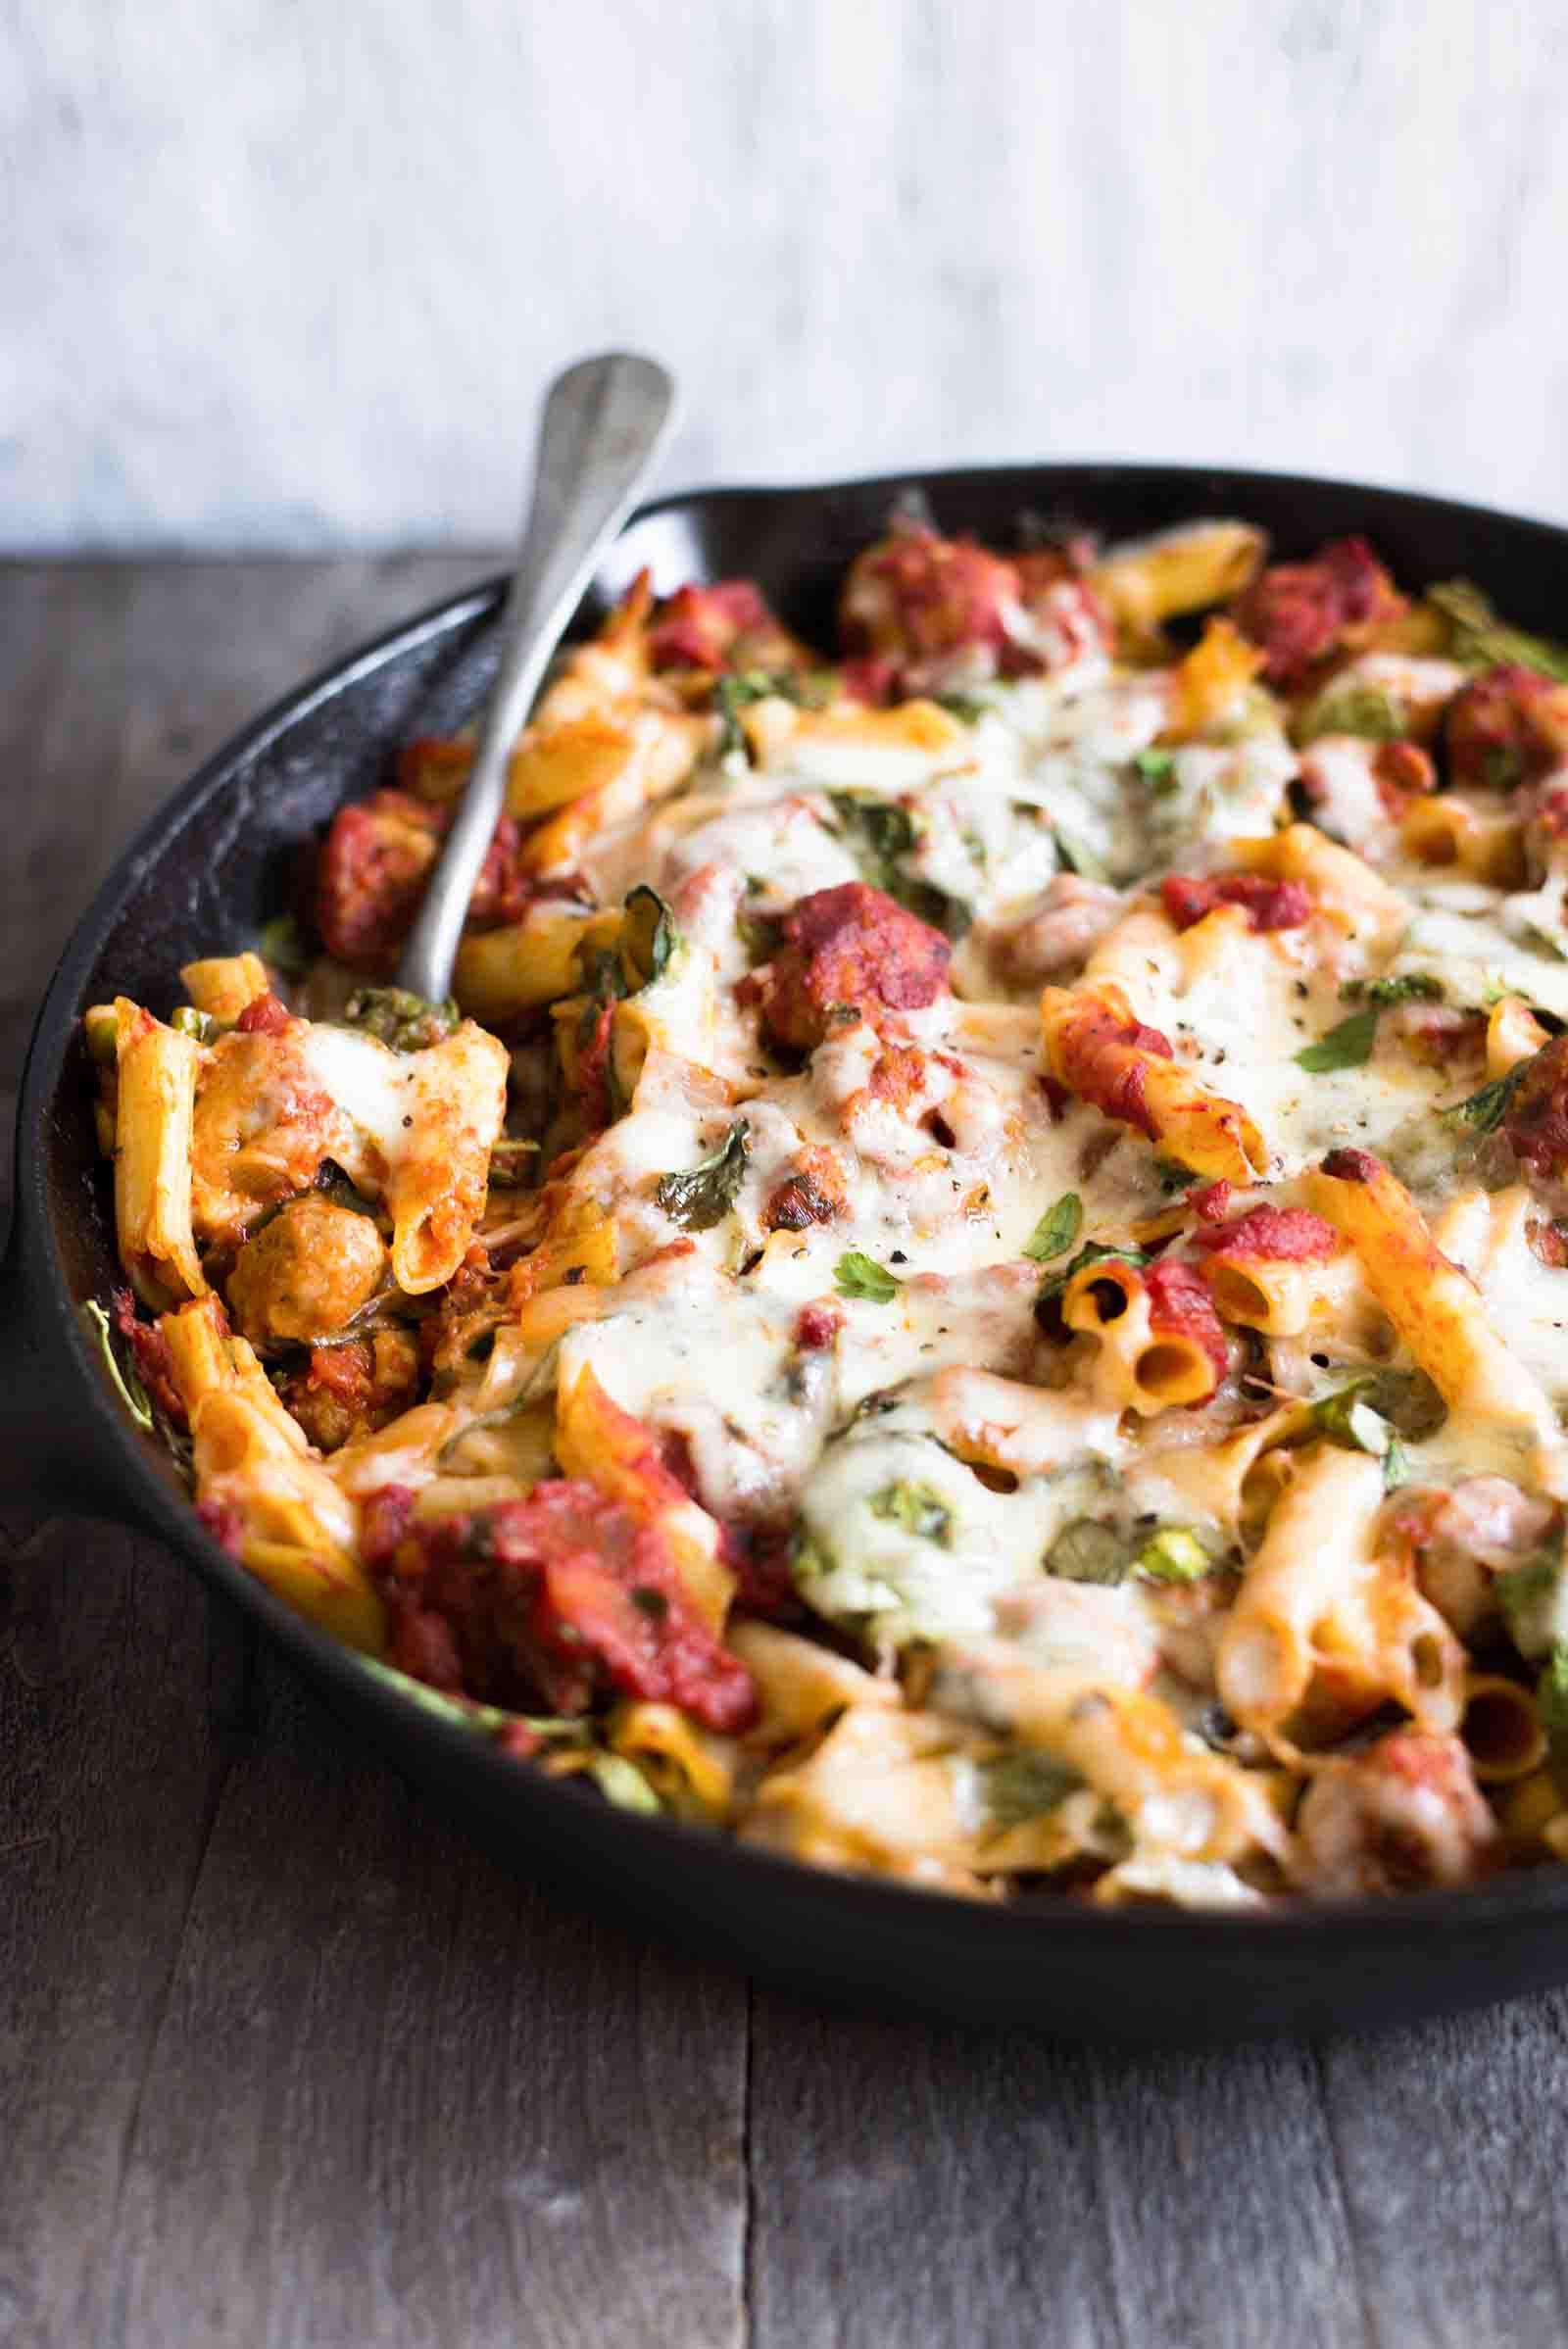 Chicken Sausage Recipes  Pasta Skillet with Chicken Sausage Cheese & Spinach